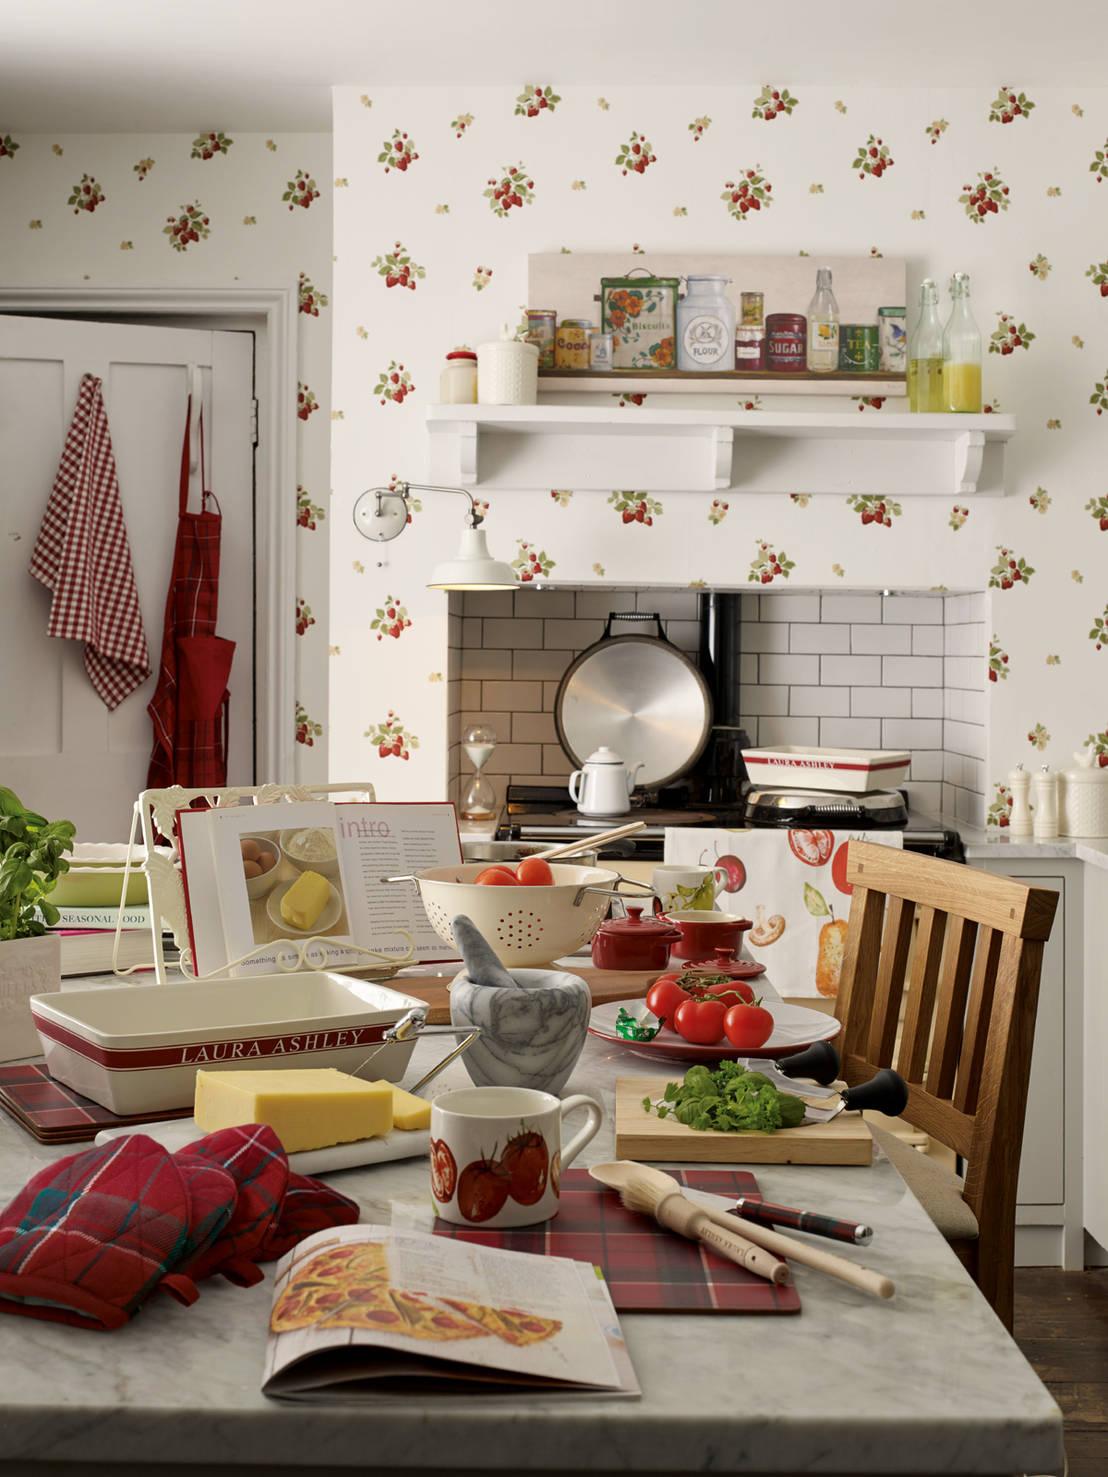 Cocina ambleside aw15 de laura ashley decoraci n homify - Libros de decoracion de interiores gratis ...